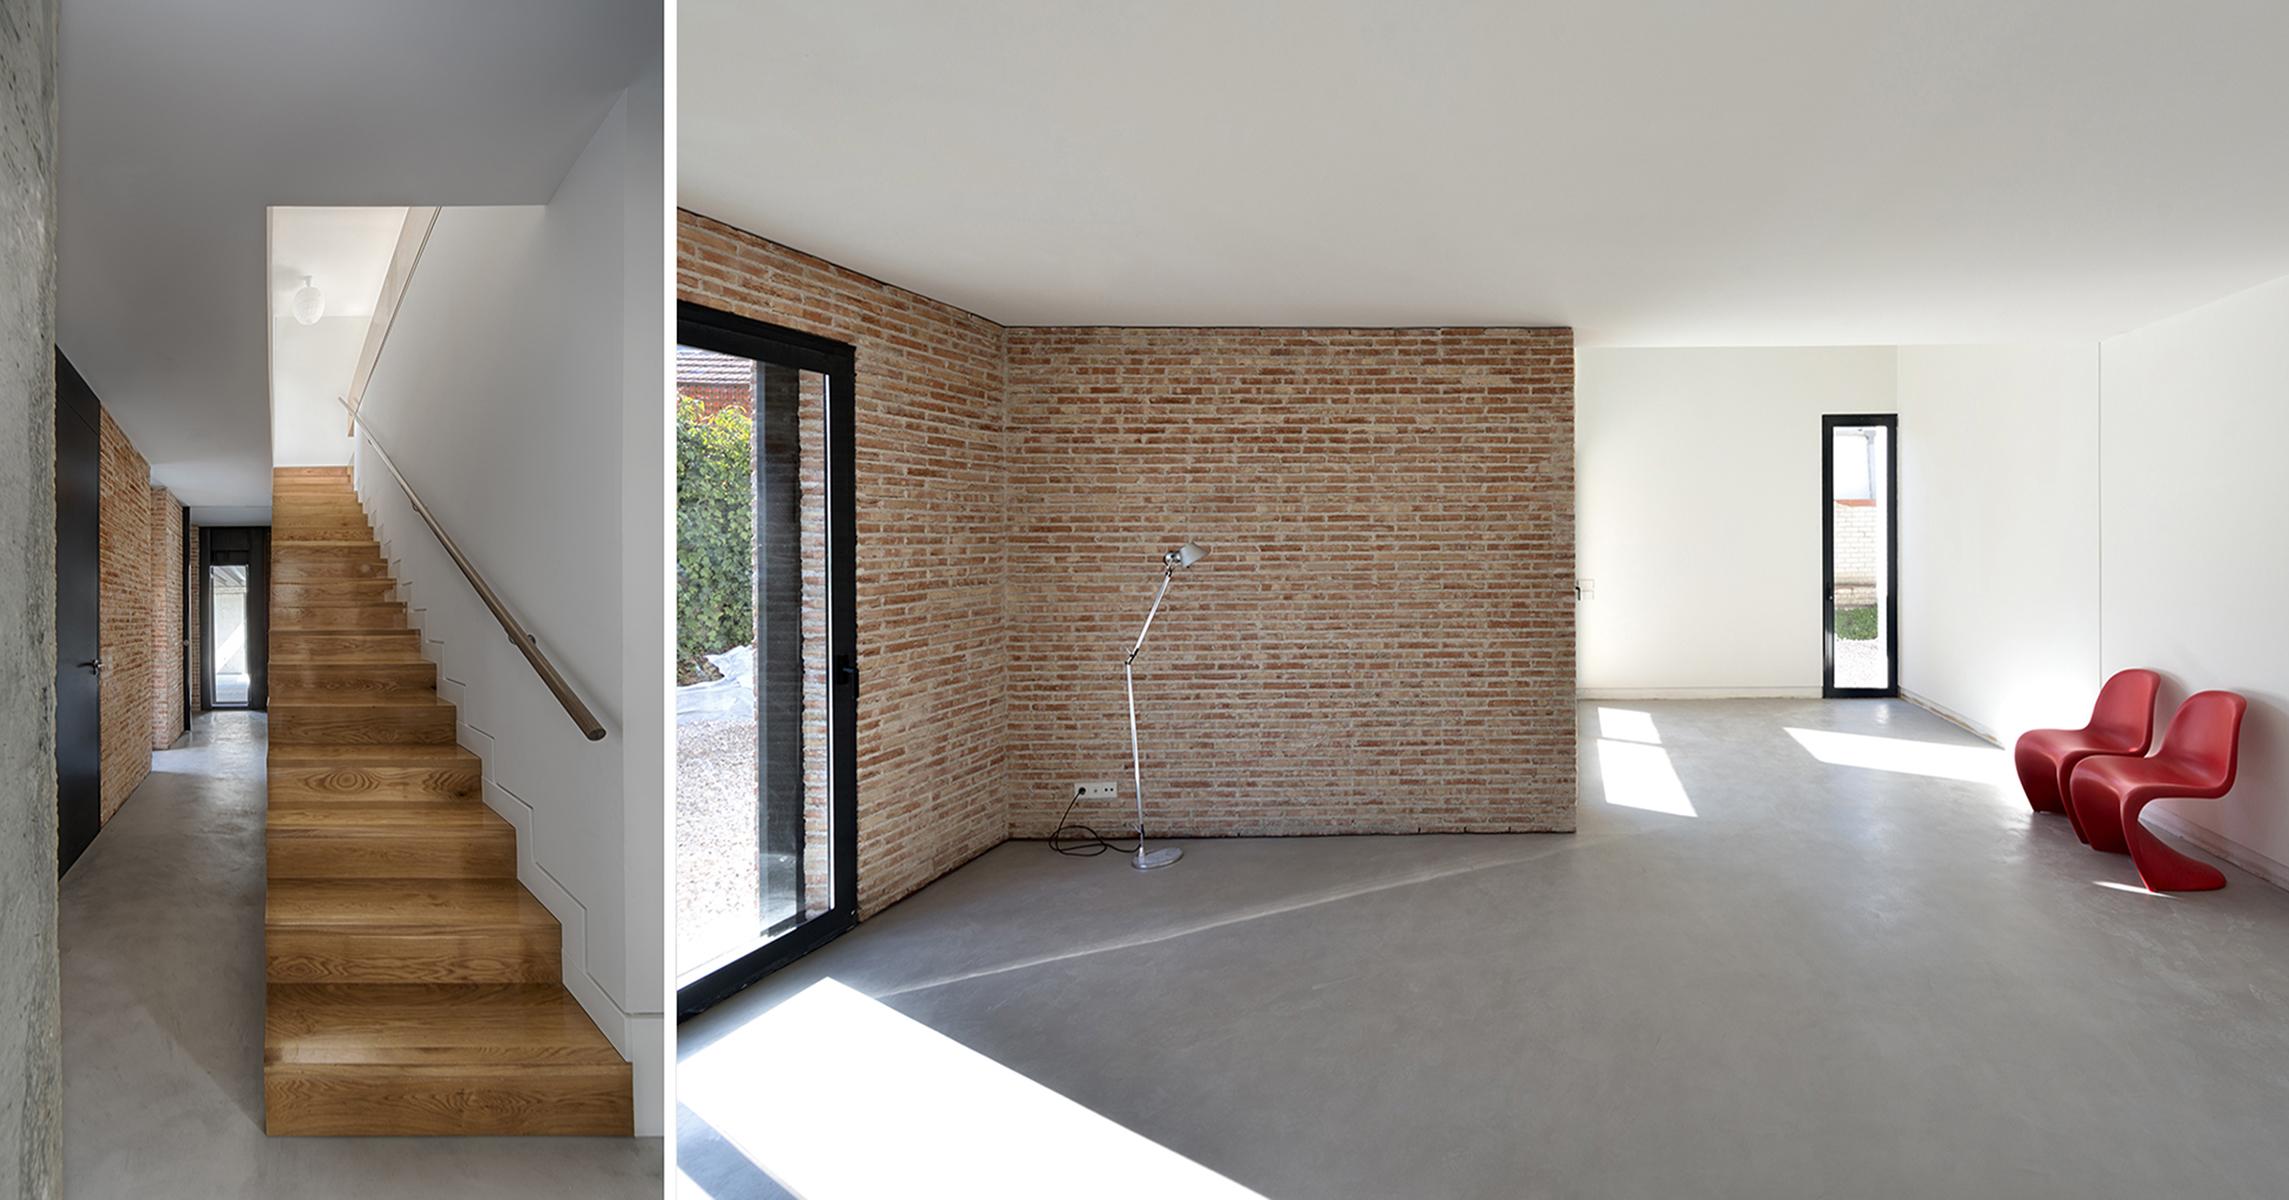 iA_house landínez+rey interior